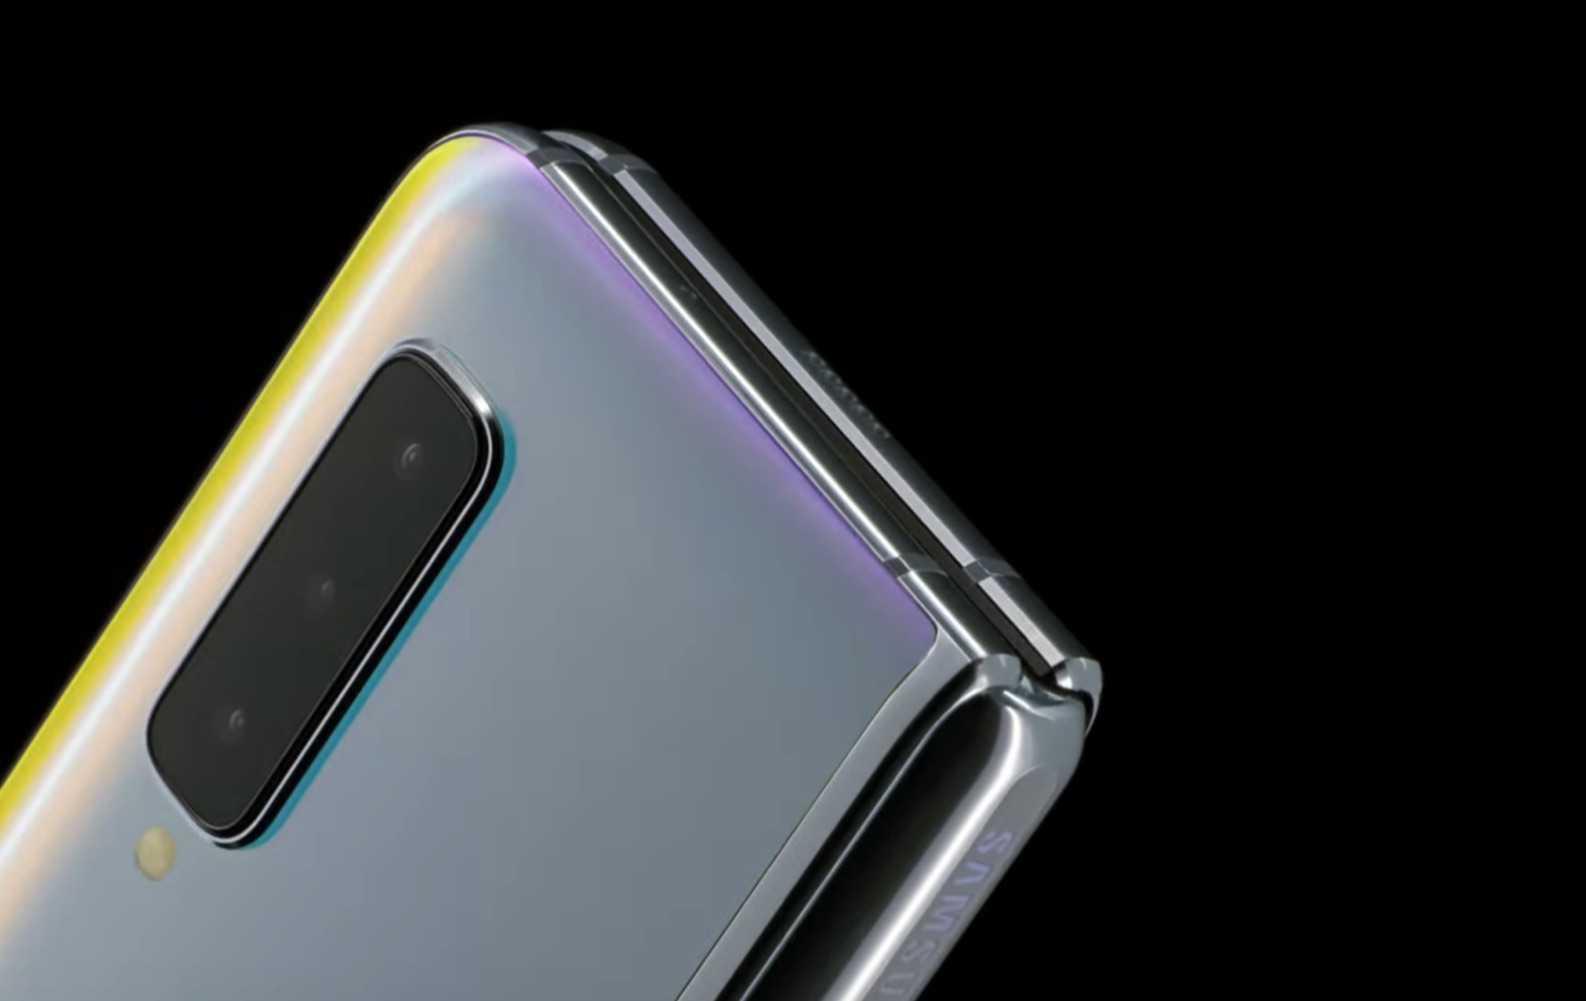 Hangisi daha iyi? Huawei Mate X mi Samsung Galaxy Fold mu?